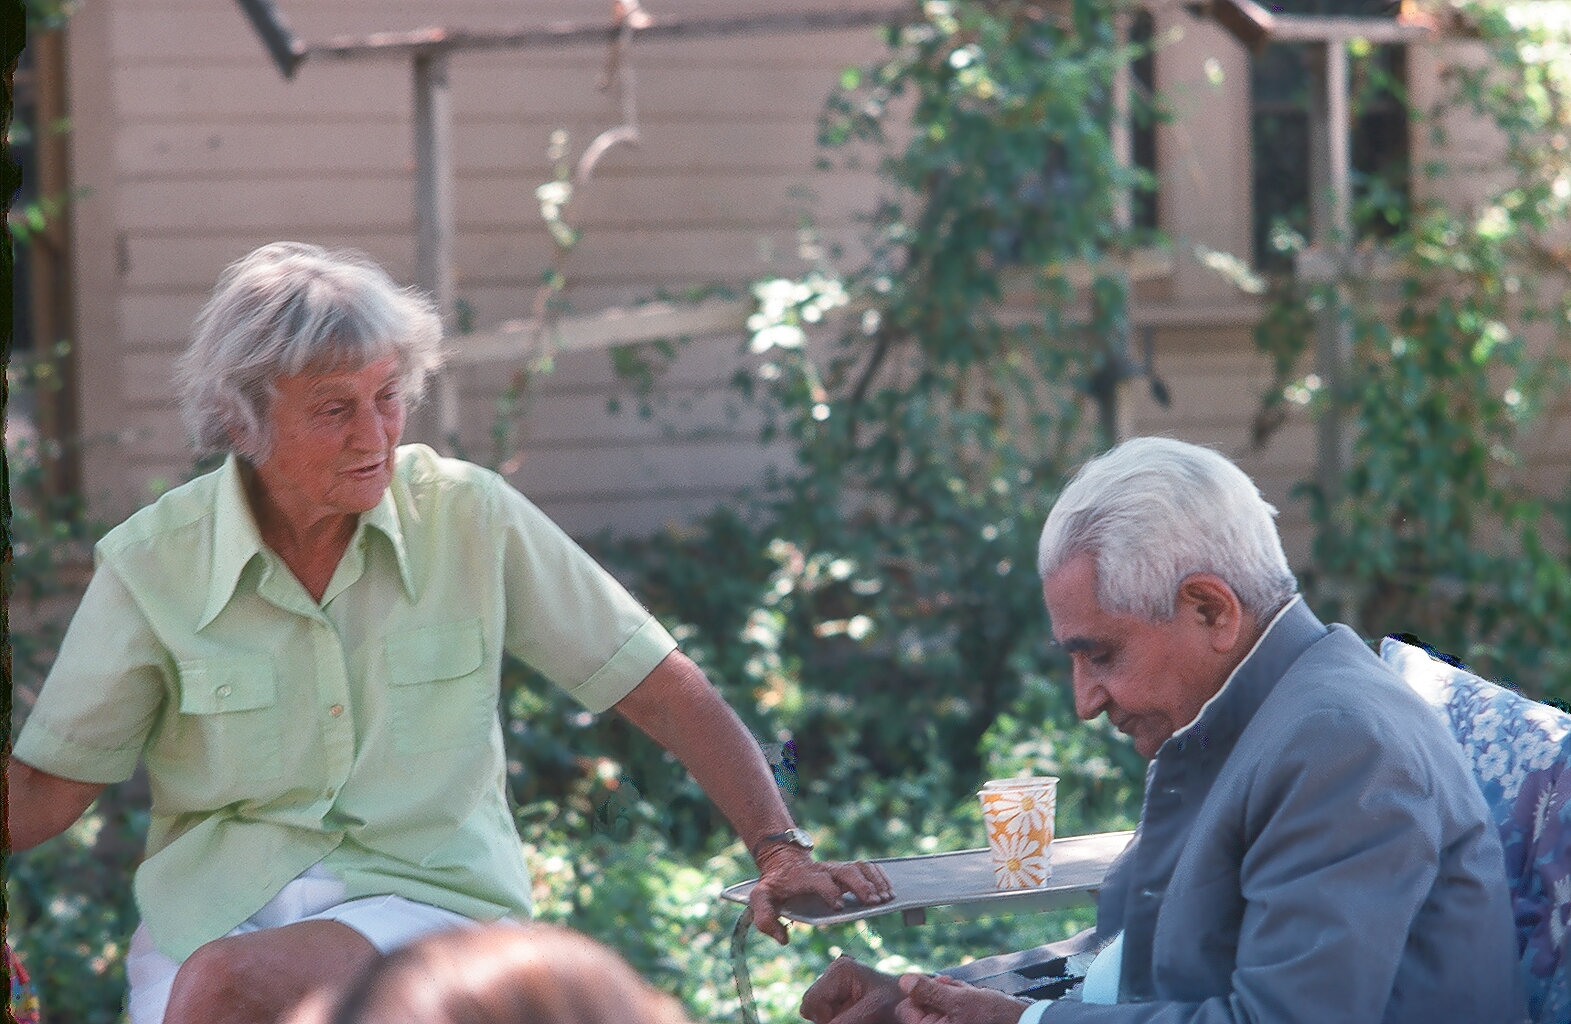 AGNES BARON & ADI K. IRANI at Meher Mount in 1977. (Photo: Sam Ervin)